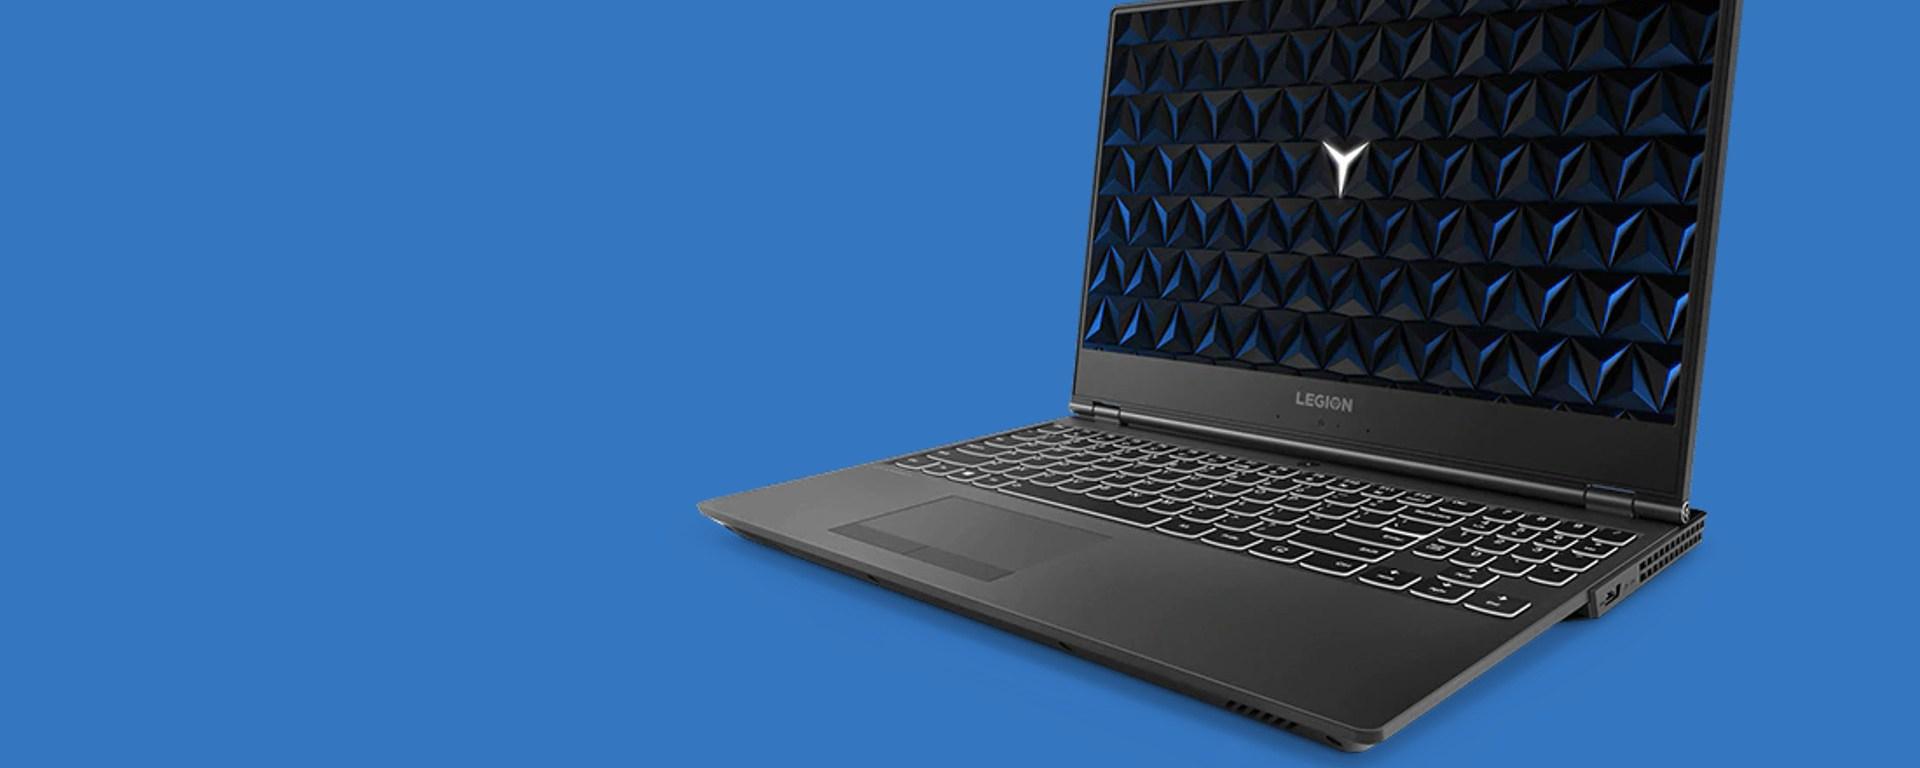 lenovo laptop legion y530 review